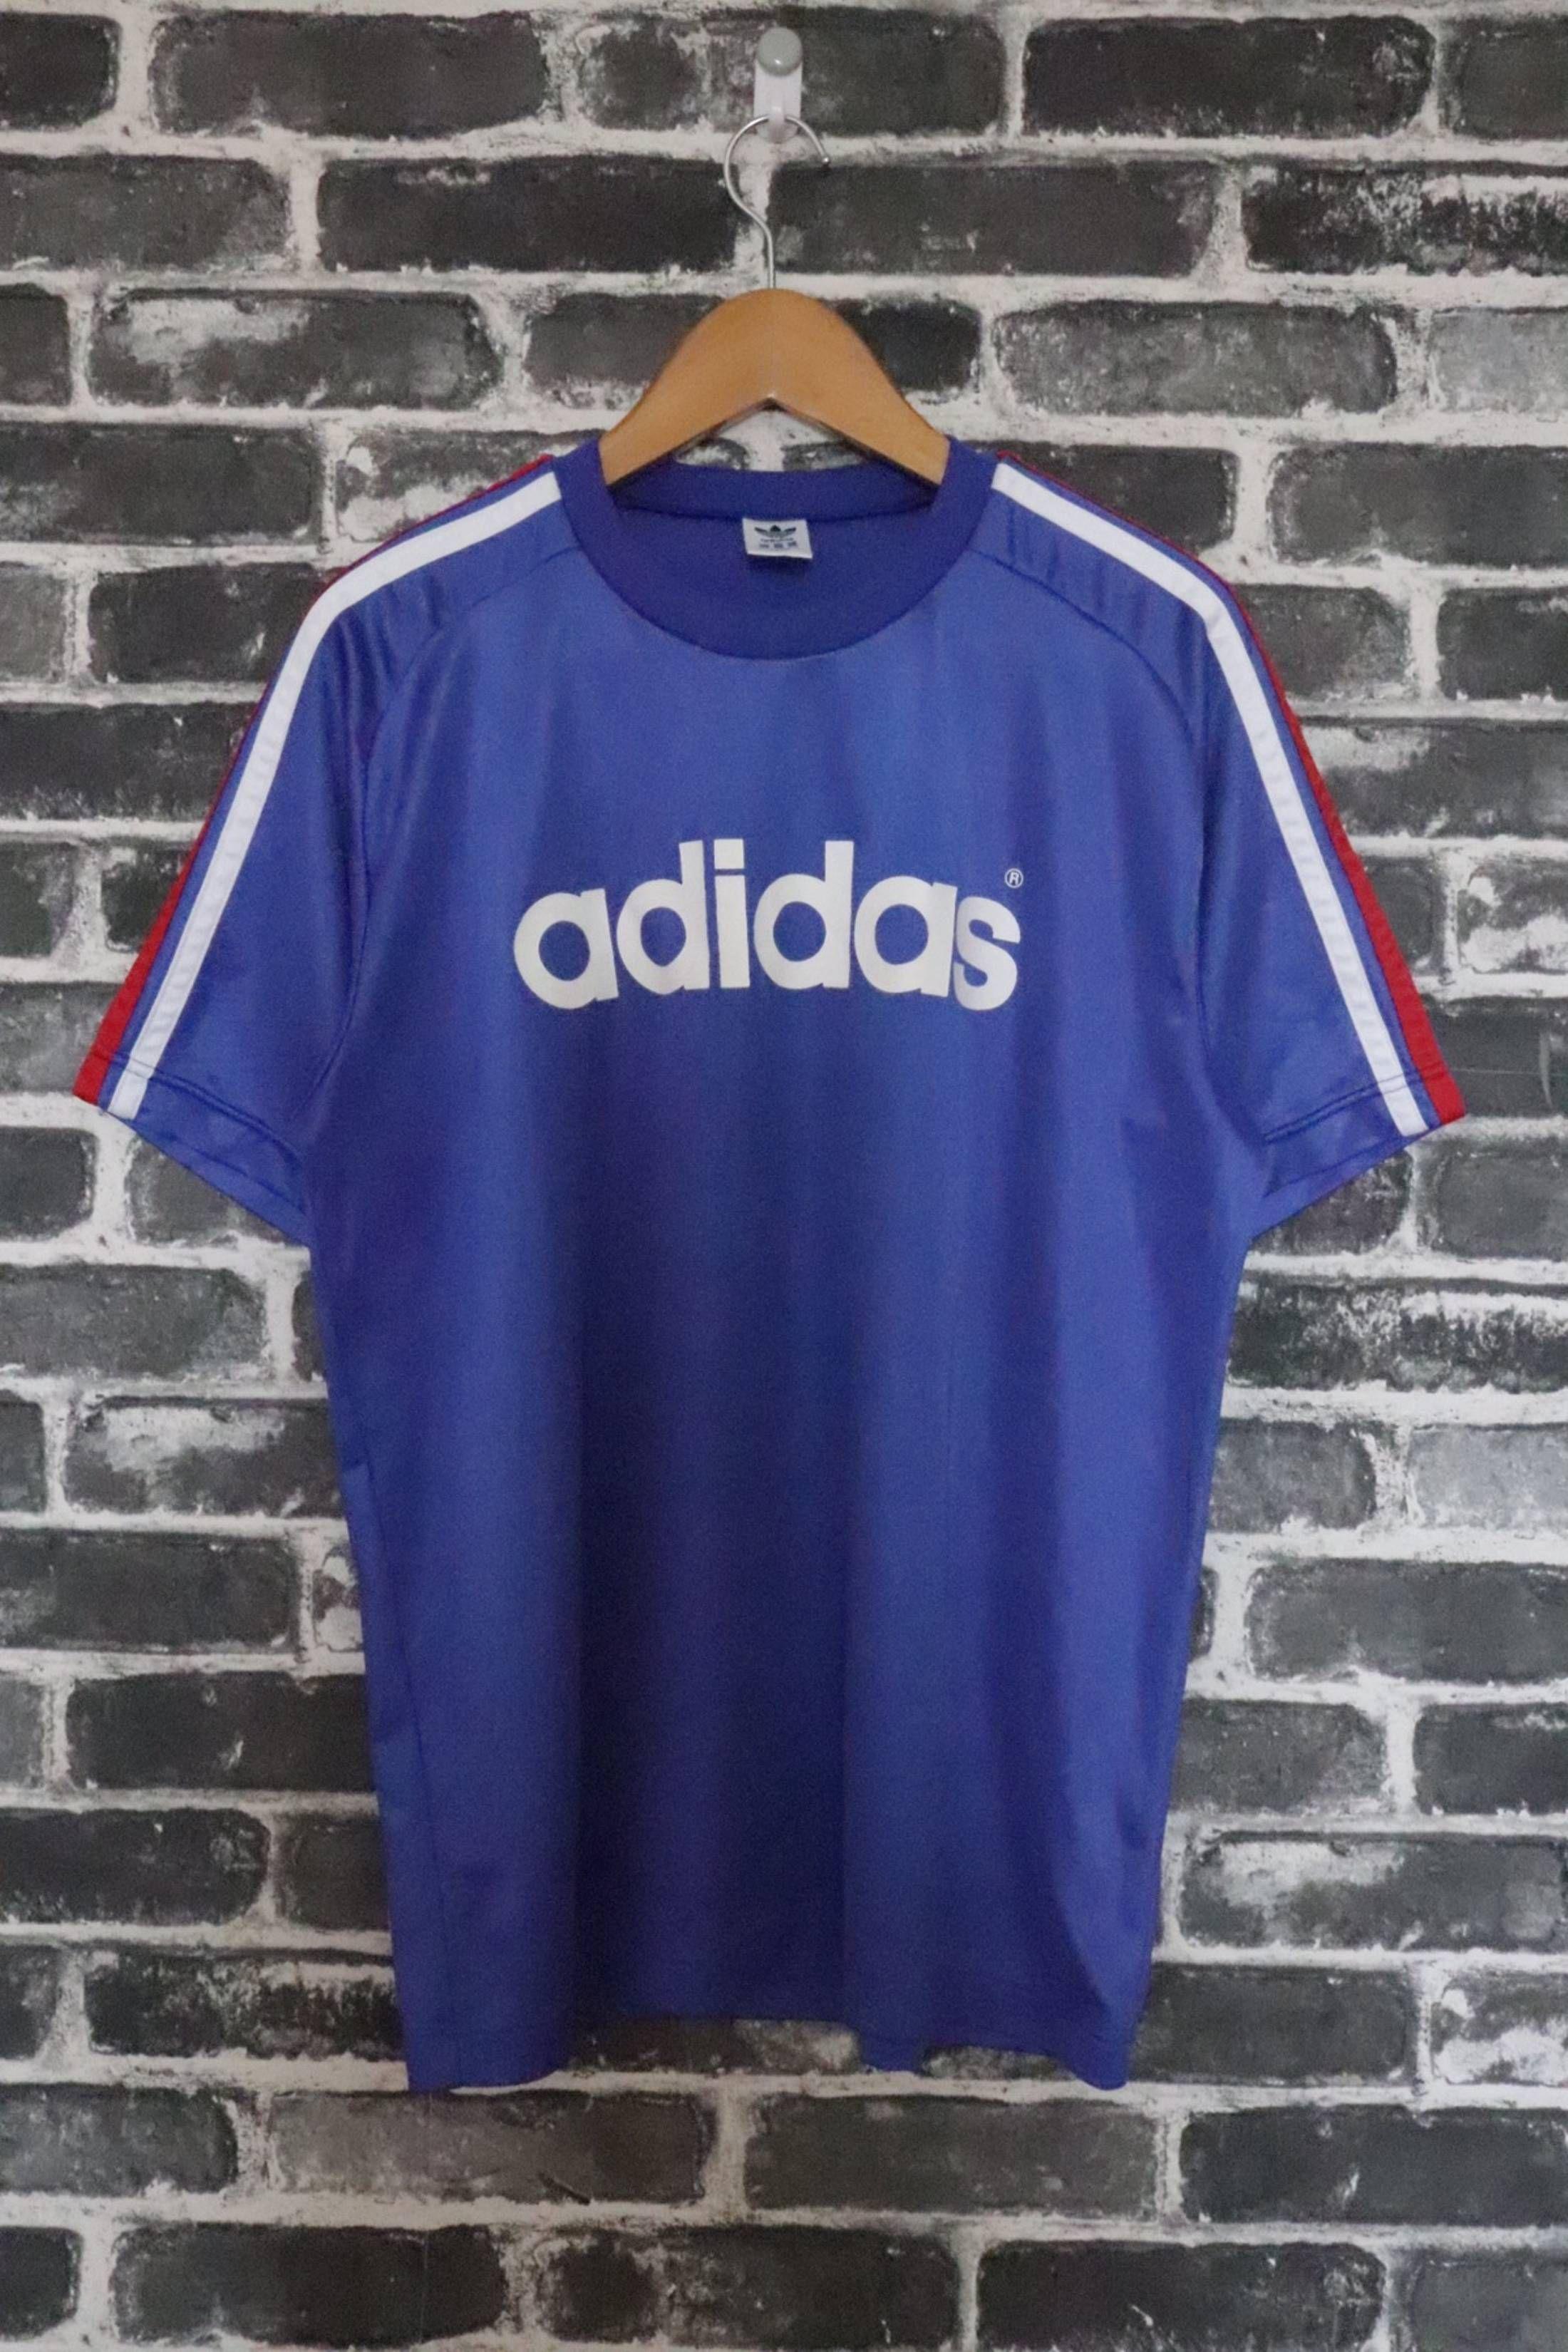 Catedral vestido deslealtad  Adidas Vintage 90s Adidas Trefoil Blue Jersey Tshirt Crew RETRO Tribute  France Big Logo / Sports Jersey Men's /Football Street Soccer Active wear/S  Size US S / …